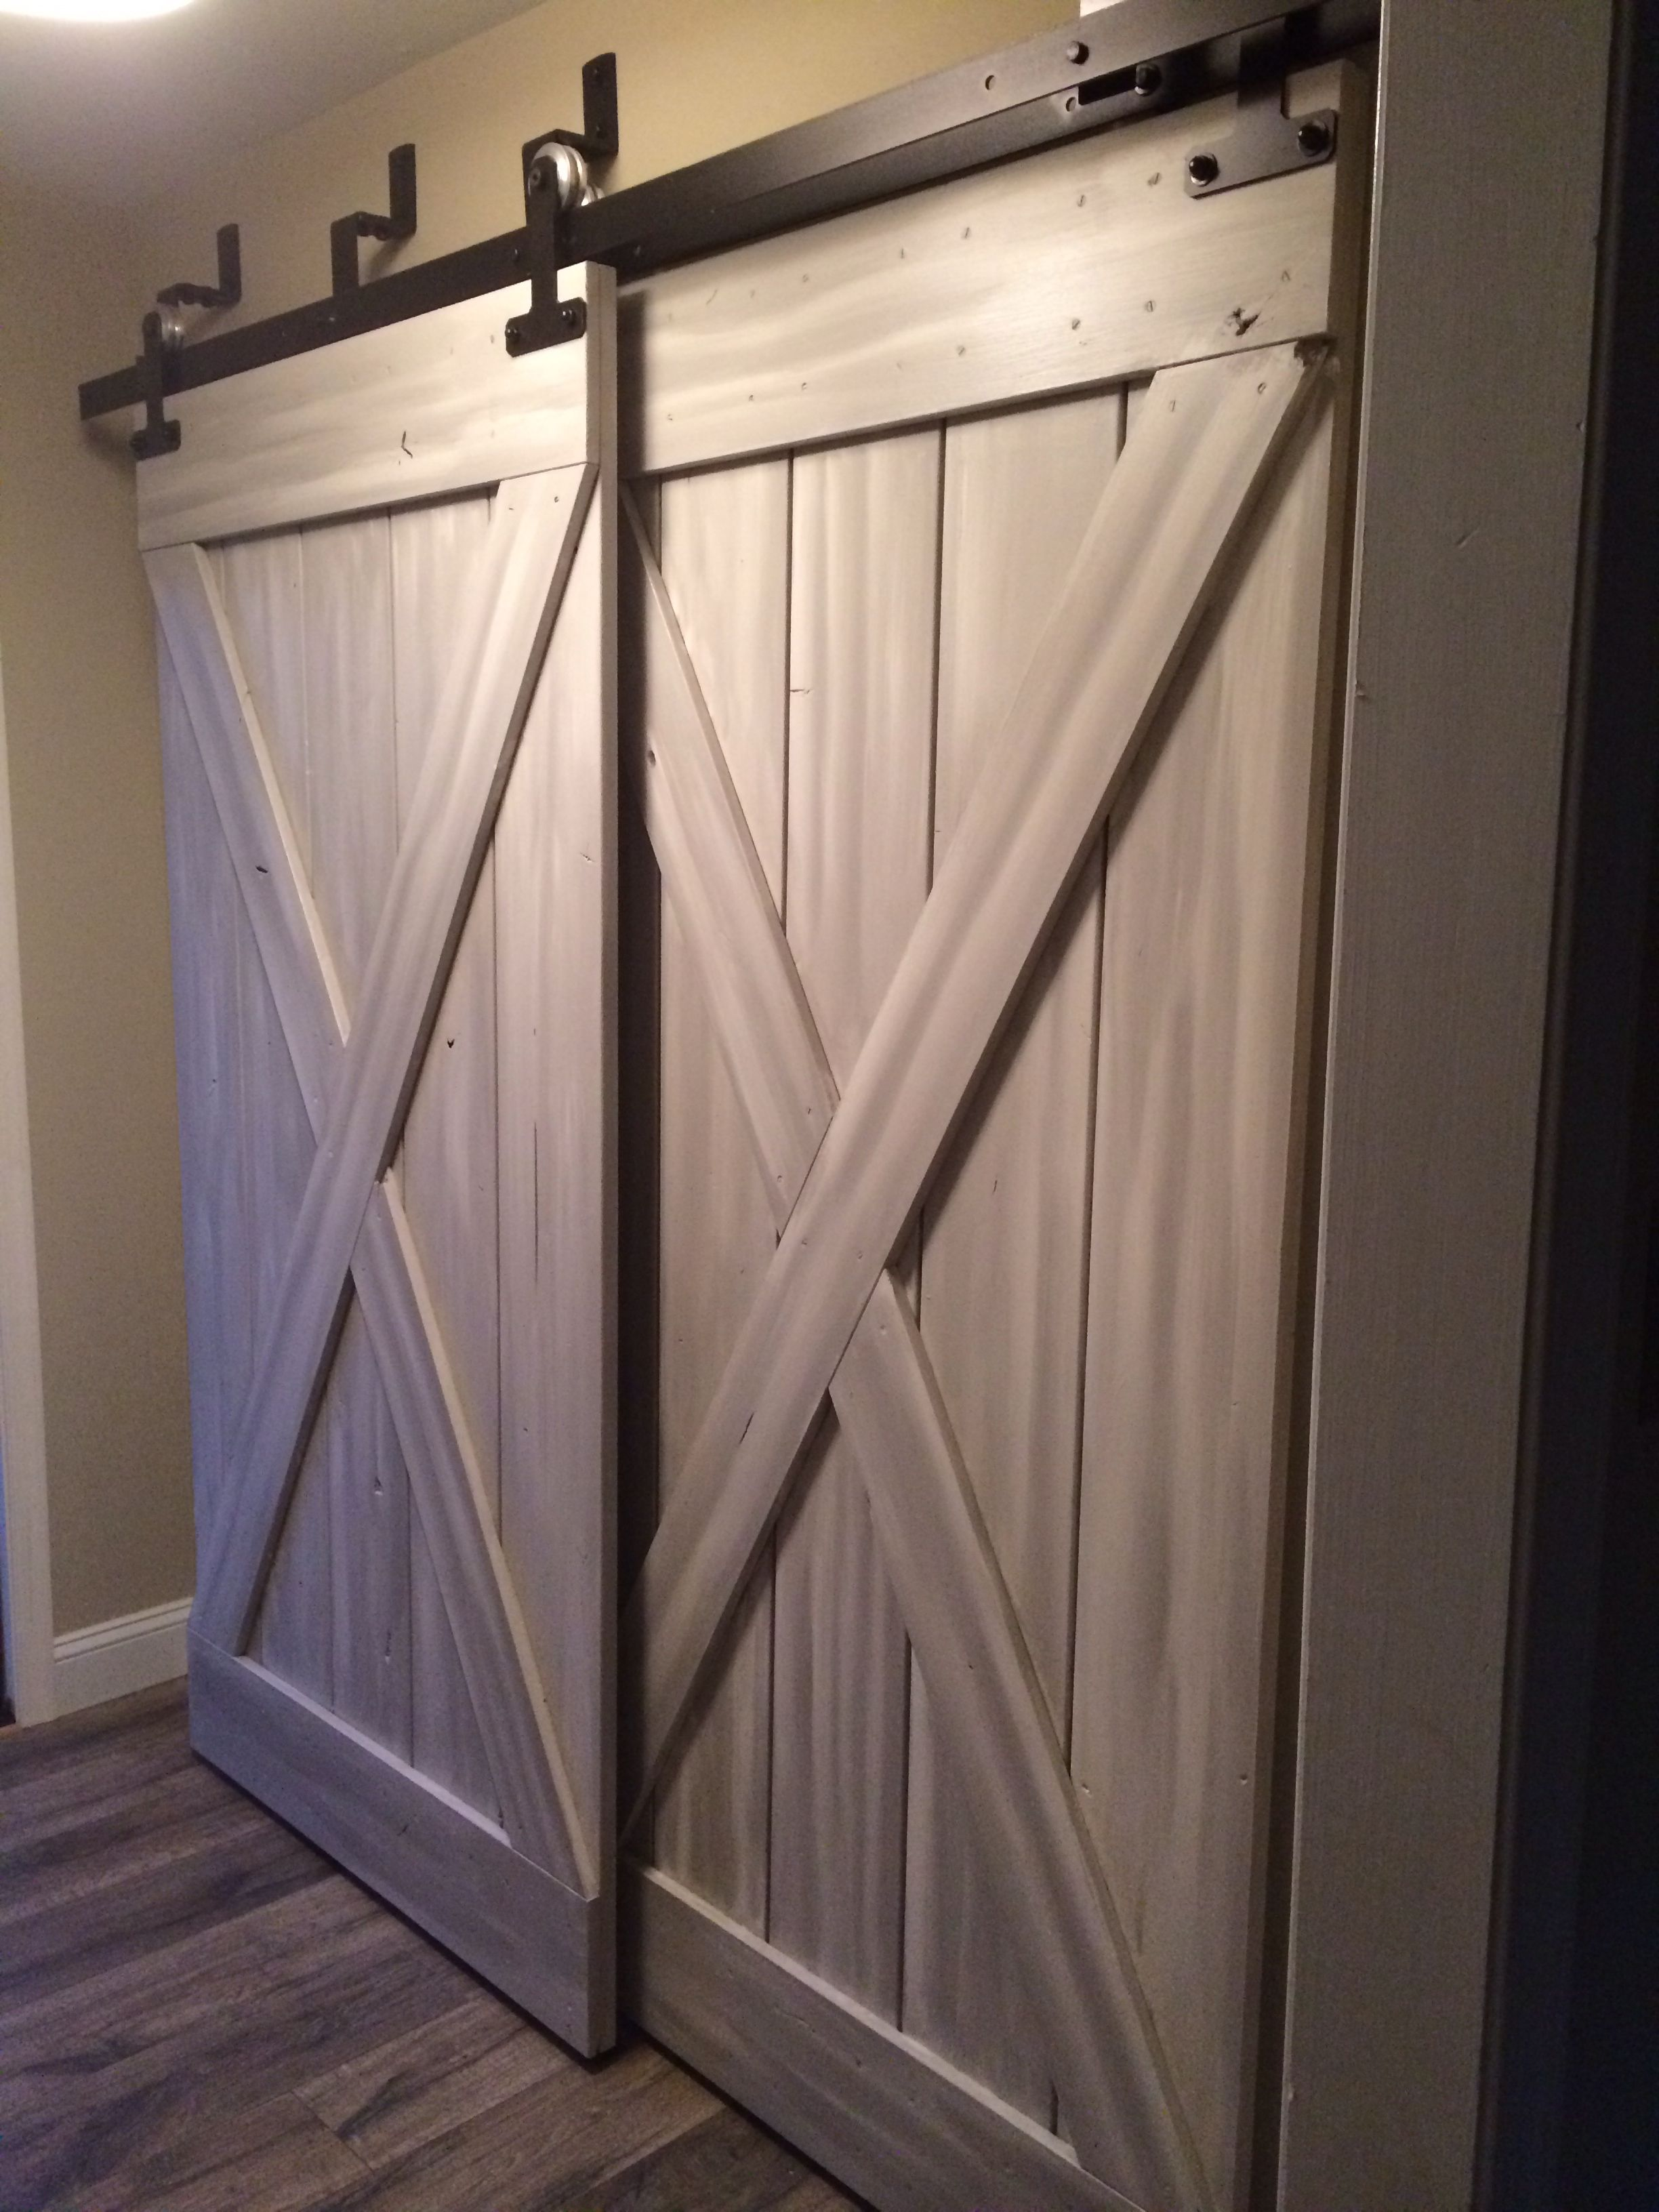 barn door design for bypass closet doors. N.V. | Home ...